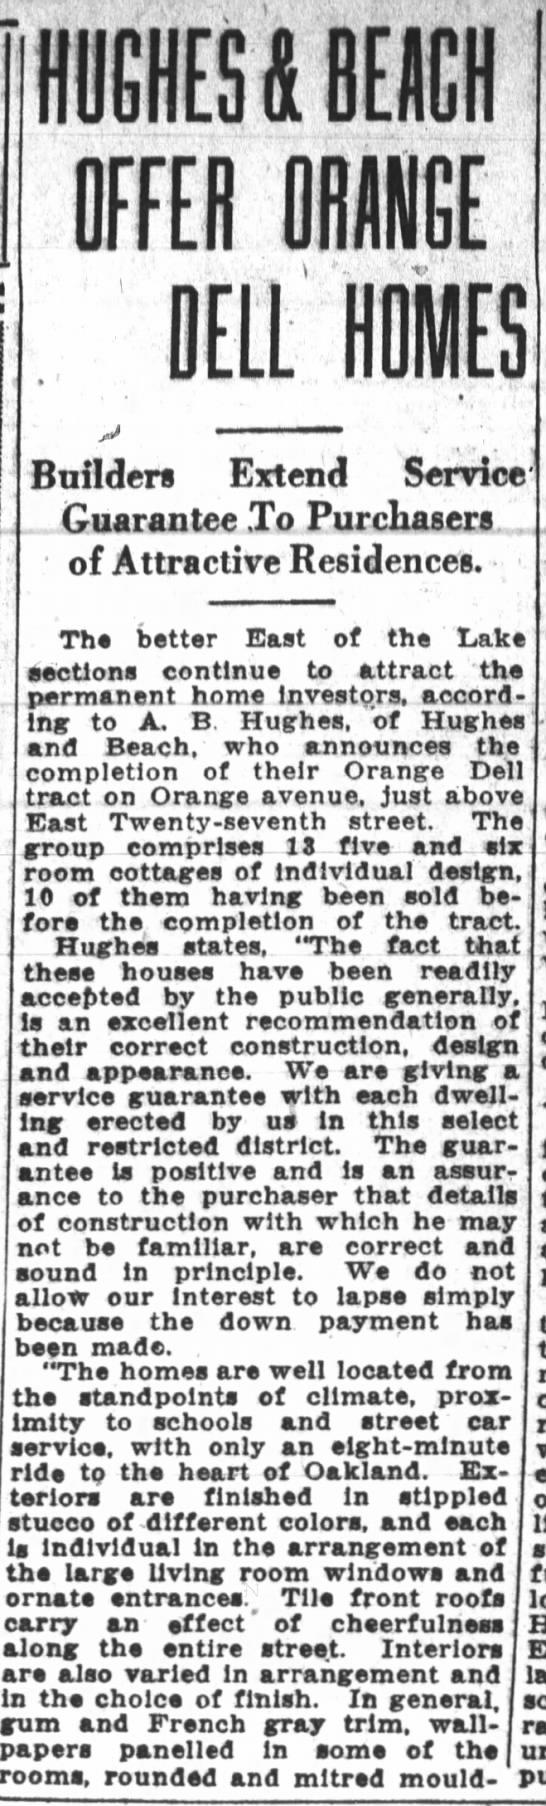 Hughes & Beach offer Orange Dell Homes Feb 25, 1926 -